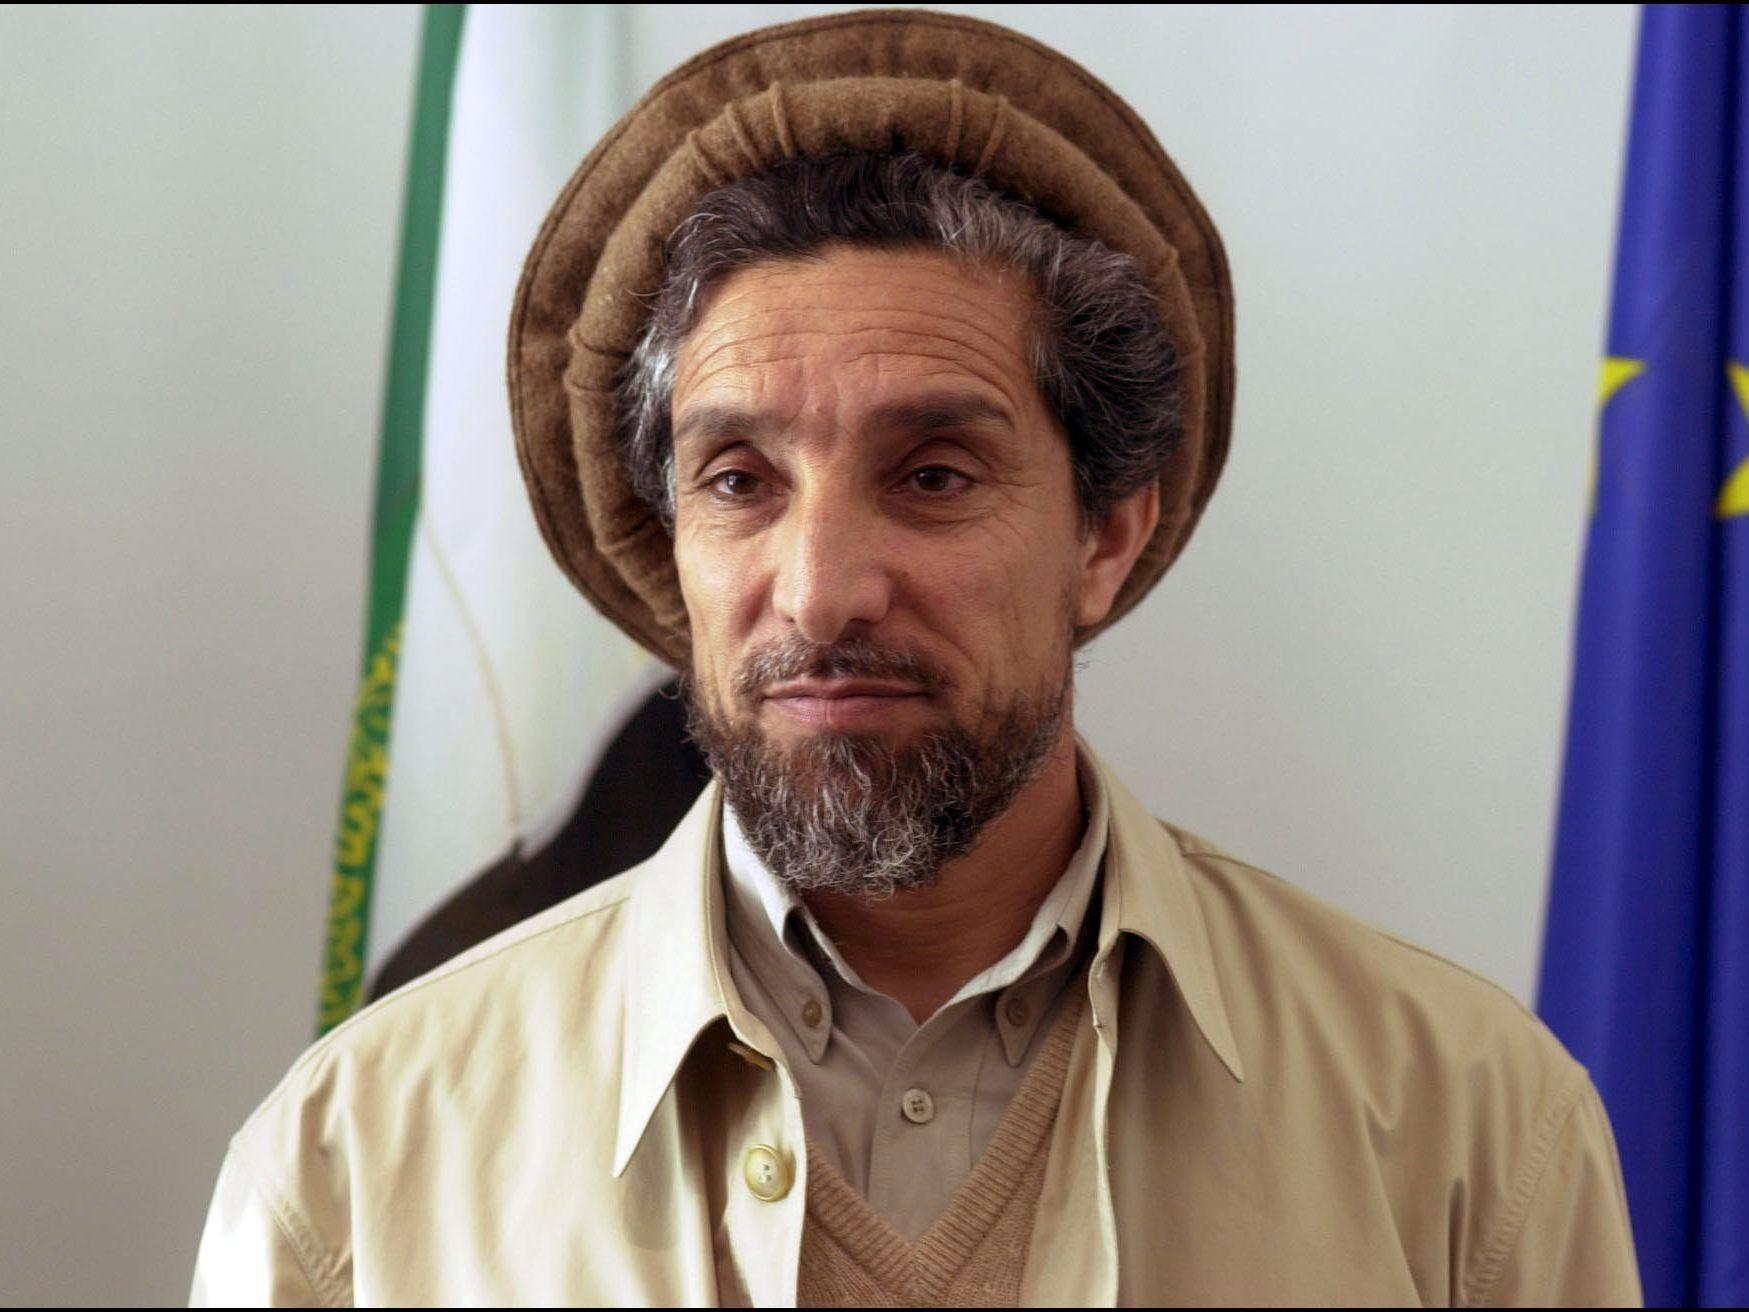 Ahmad Shah Massoud: Afghanistan's Lion of Panjshir